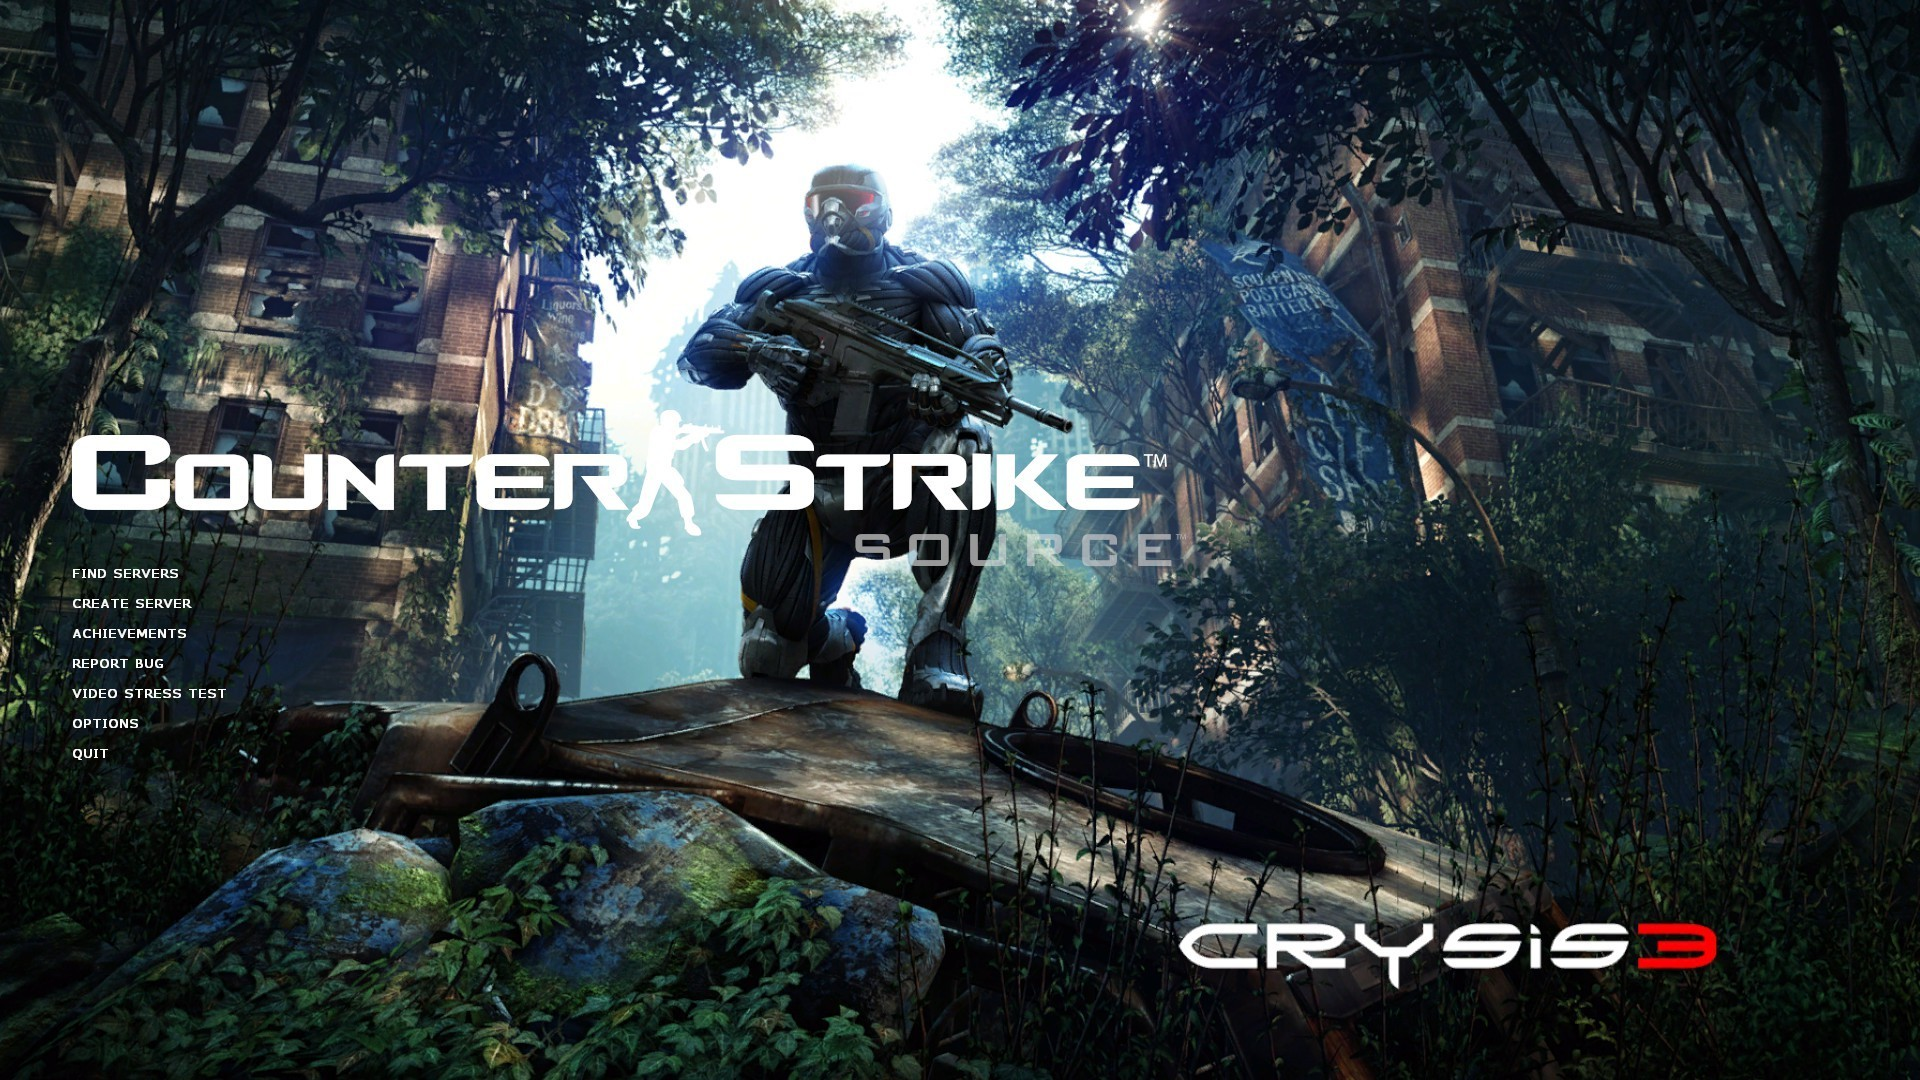 Counter Strike Source Wallpaper ·① Counter Strike Wallpaper Hd